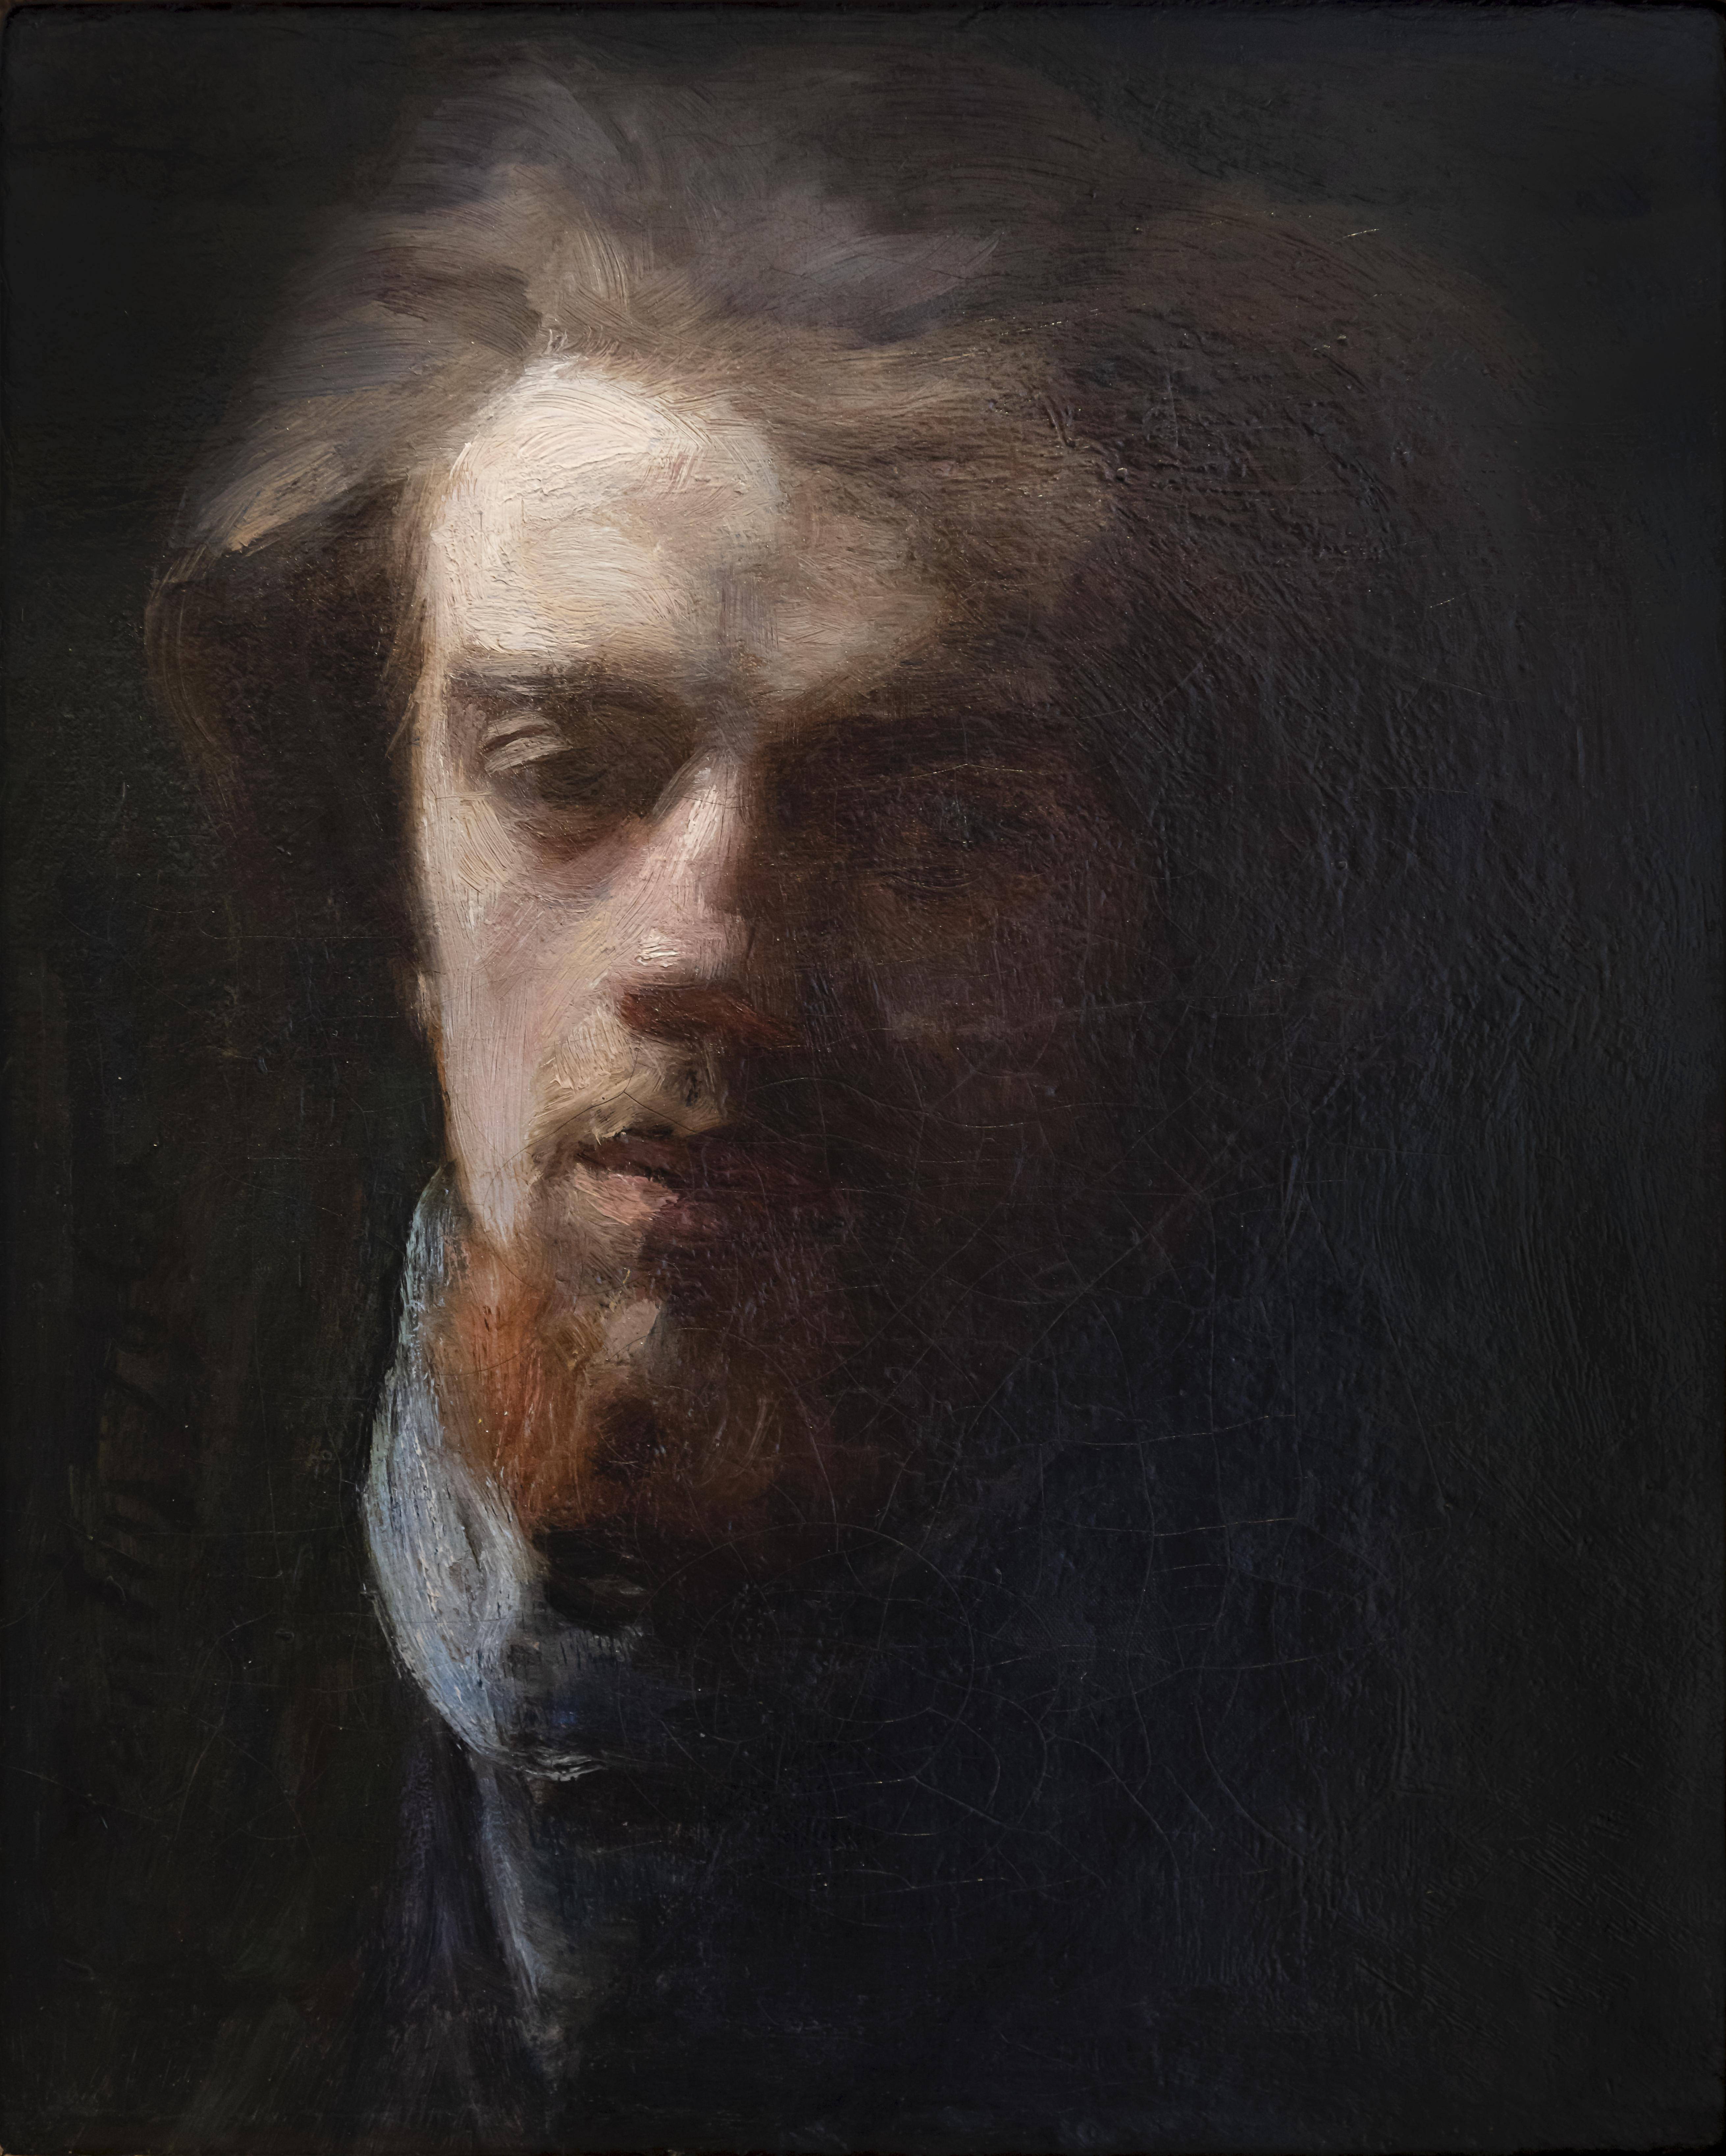 Image of Henri Fantin-Latour from Wikidata